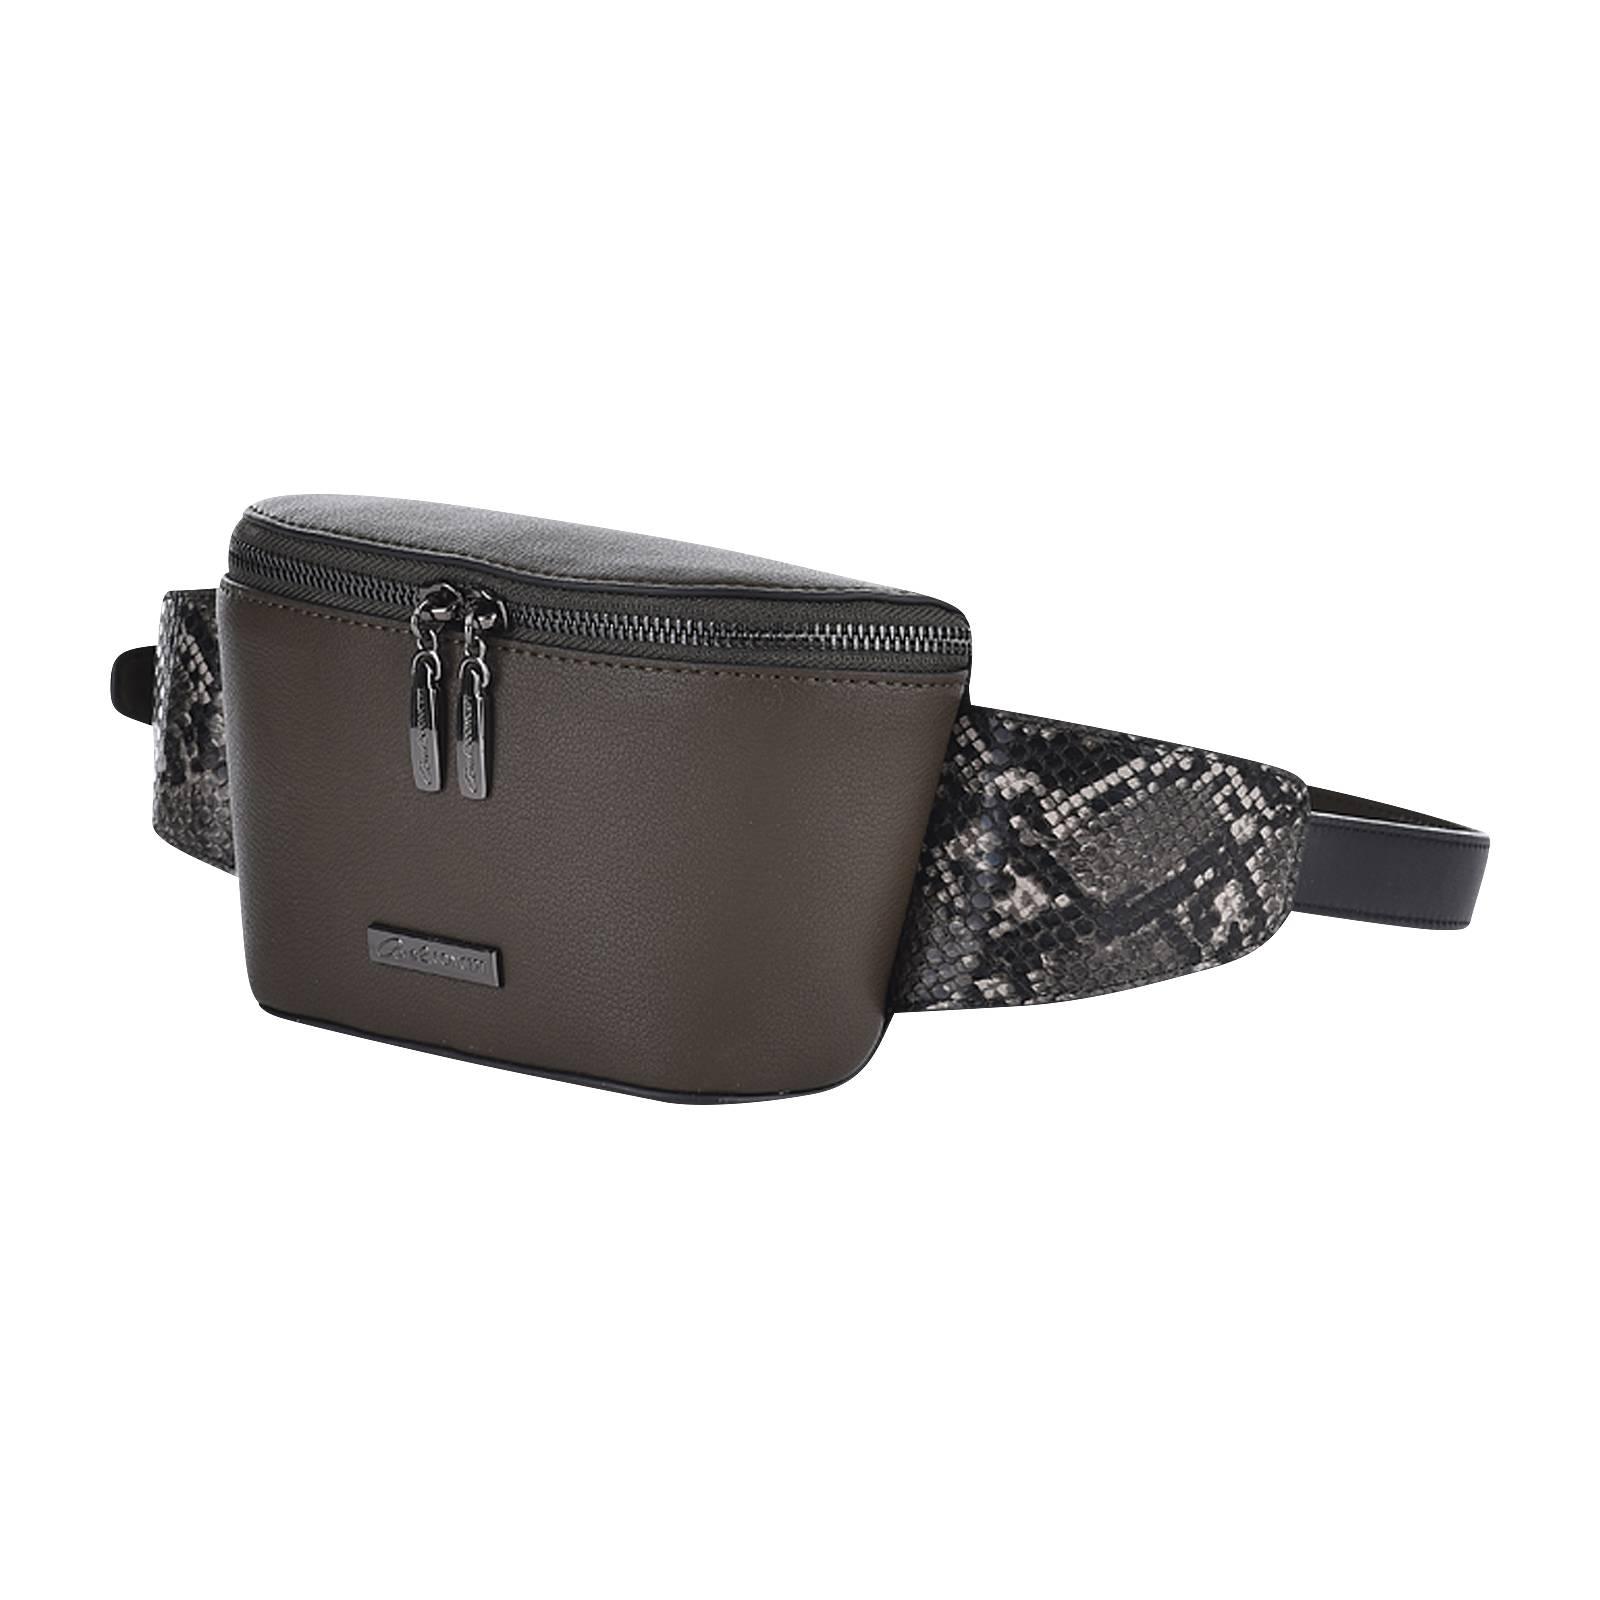 Tarchomin - Γυναικεία τσάντα Axel Concept από δερμα συνθετικο και ... 6793fbcda72